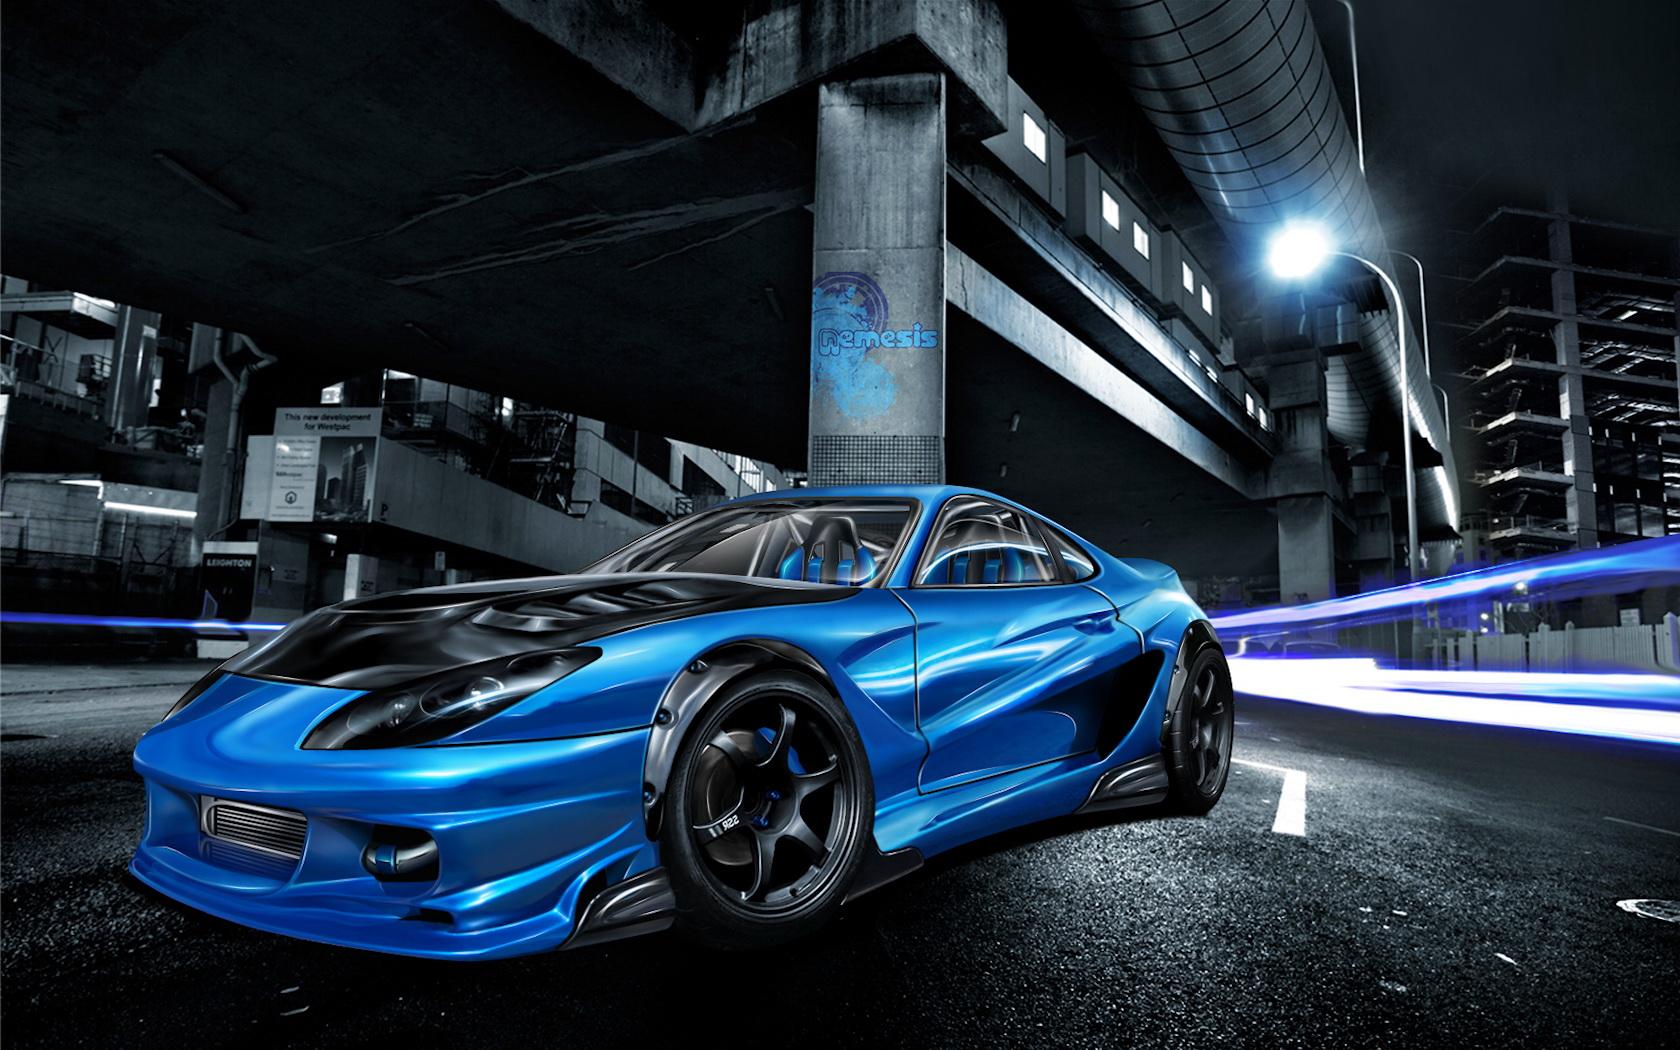 Car Racing Wallpaper Free Download 4 Desktop Background ...